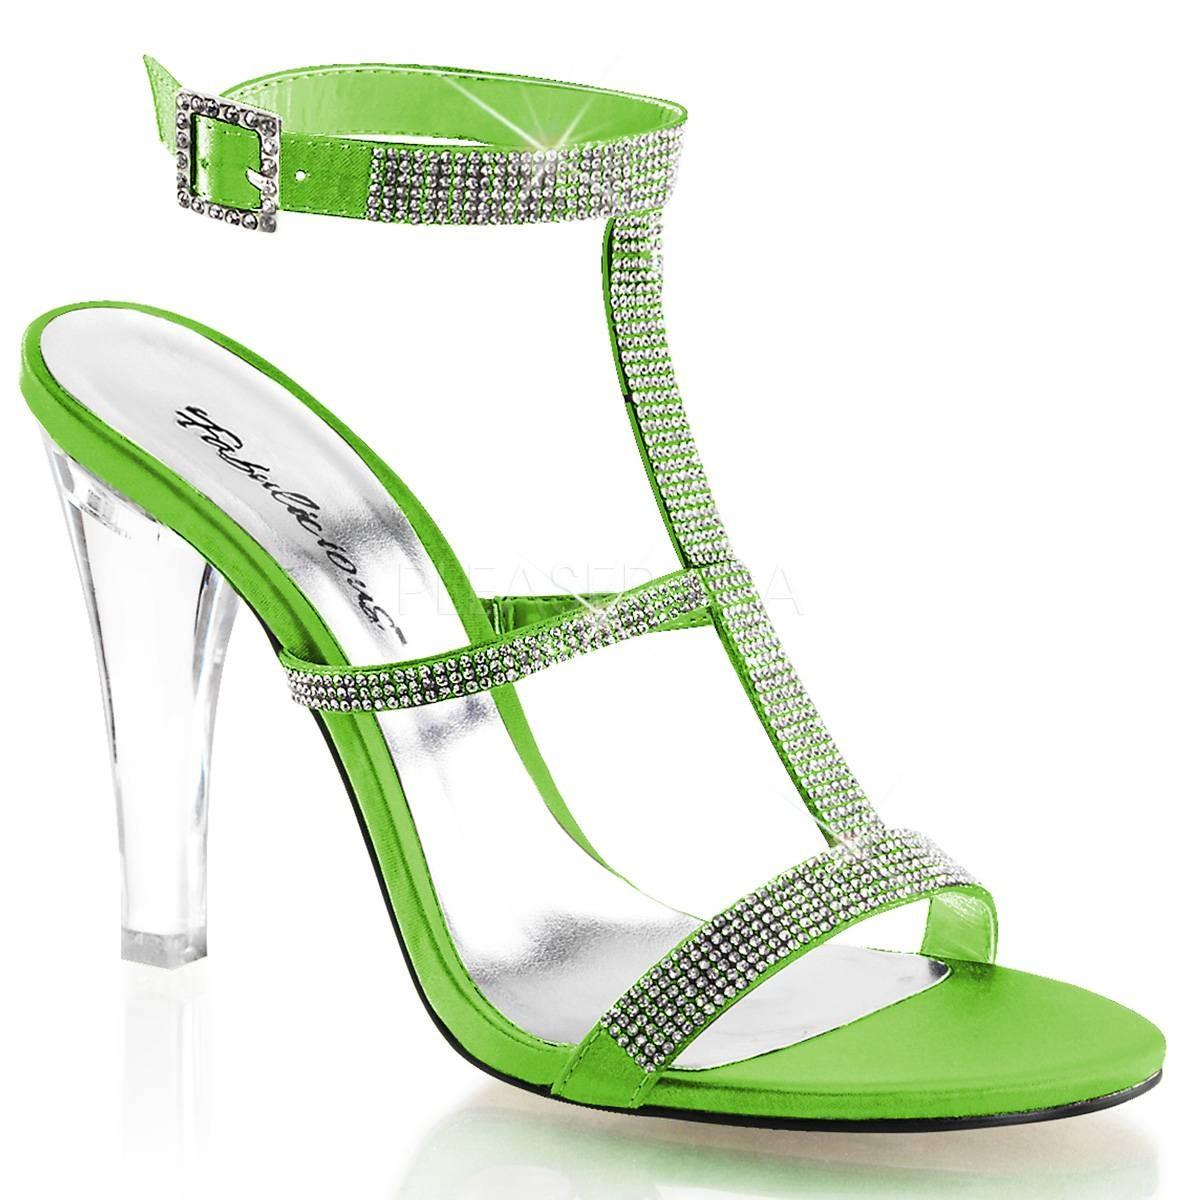 Sandalen - CLEARLY 418 ° Damen Sandalette ° Grün Satin ° Fabulicious  - Onlineshop RedSixty